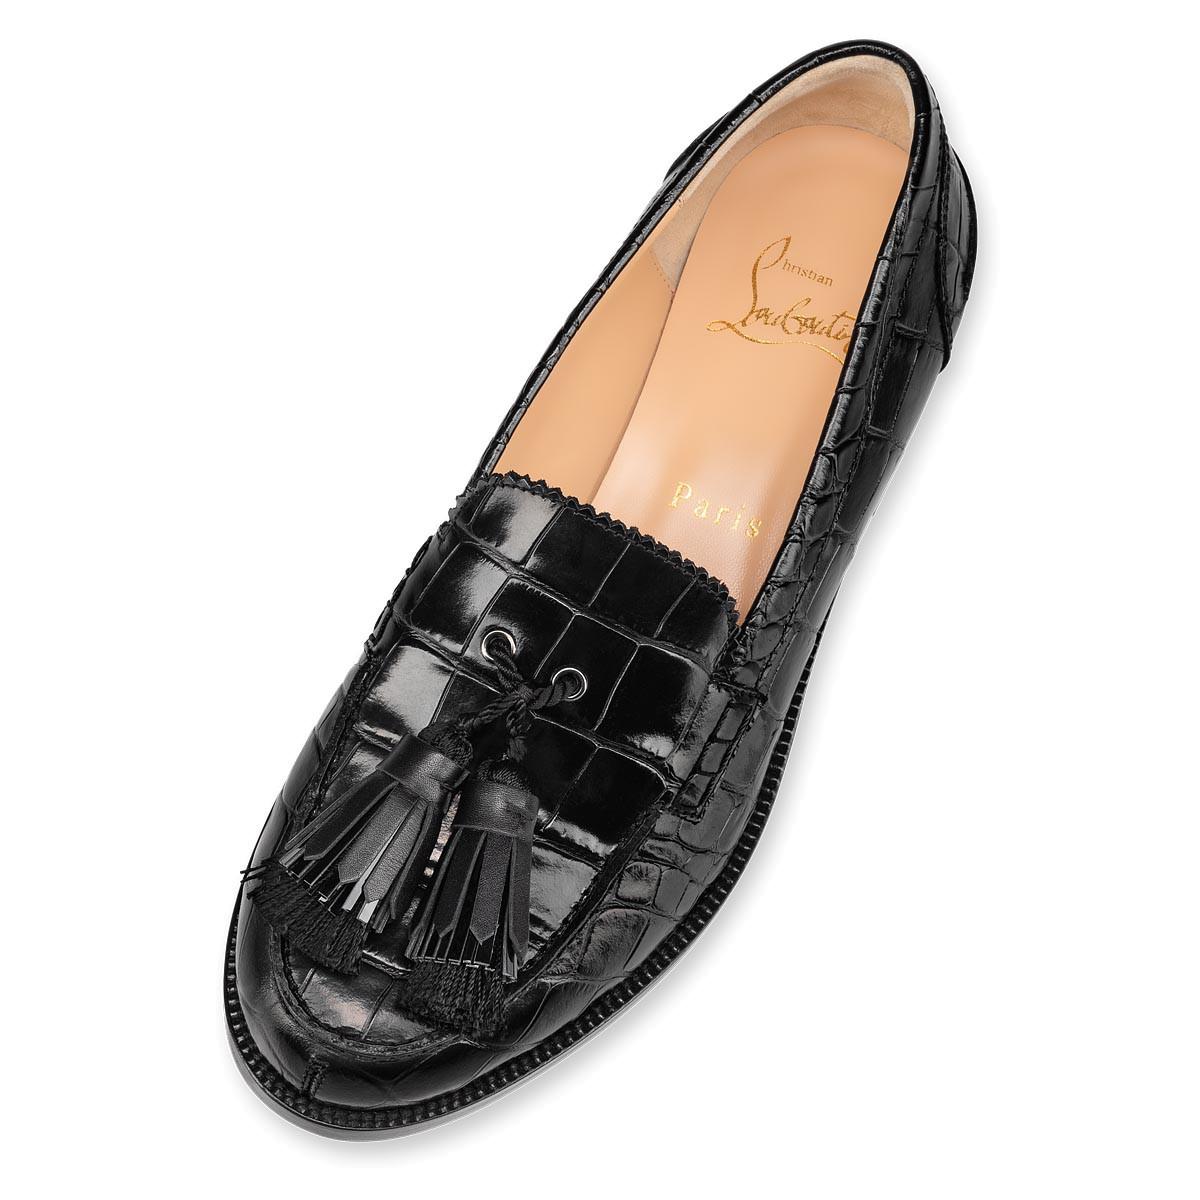 Shoes - Badmoc Flat - Christian Louboutin